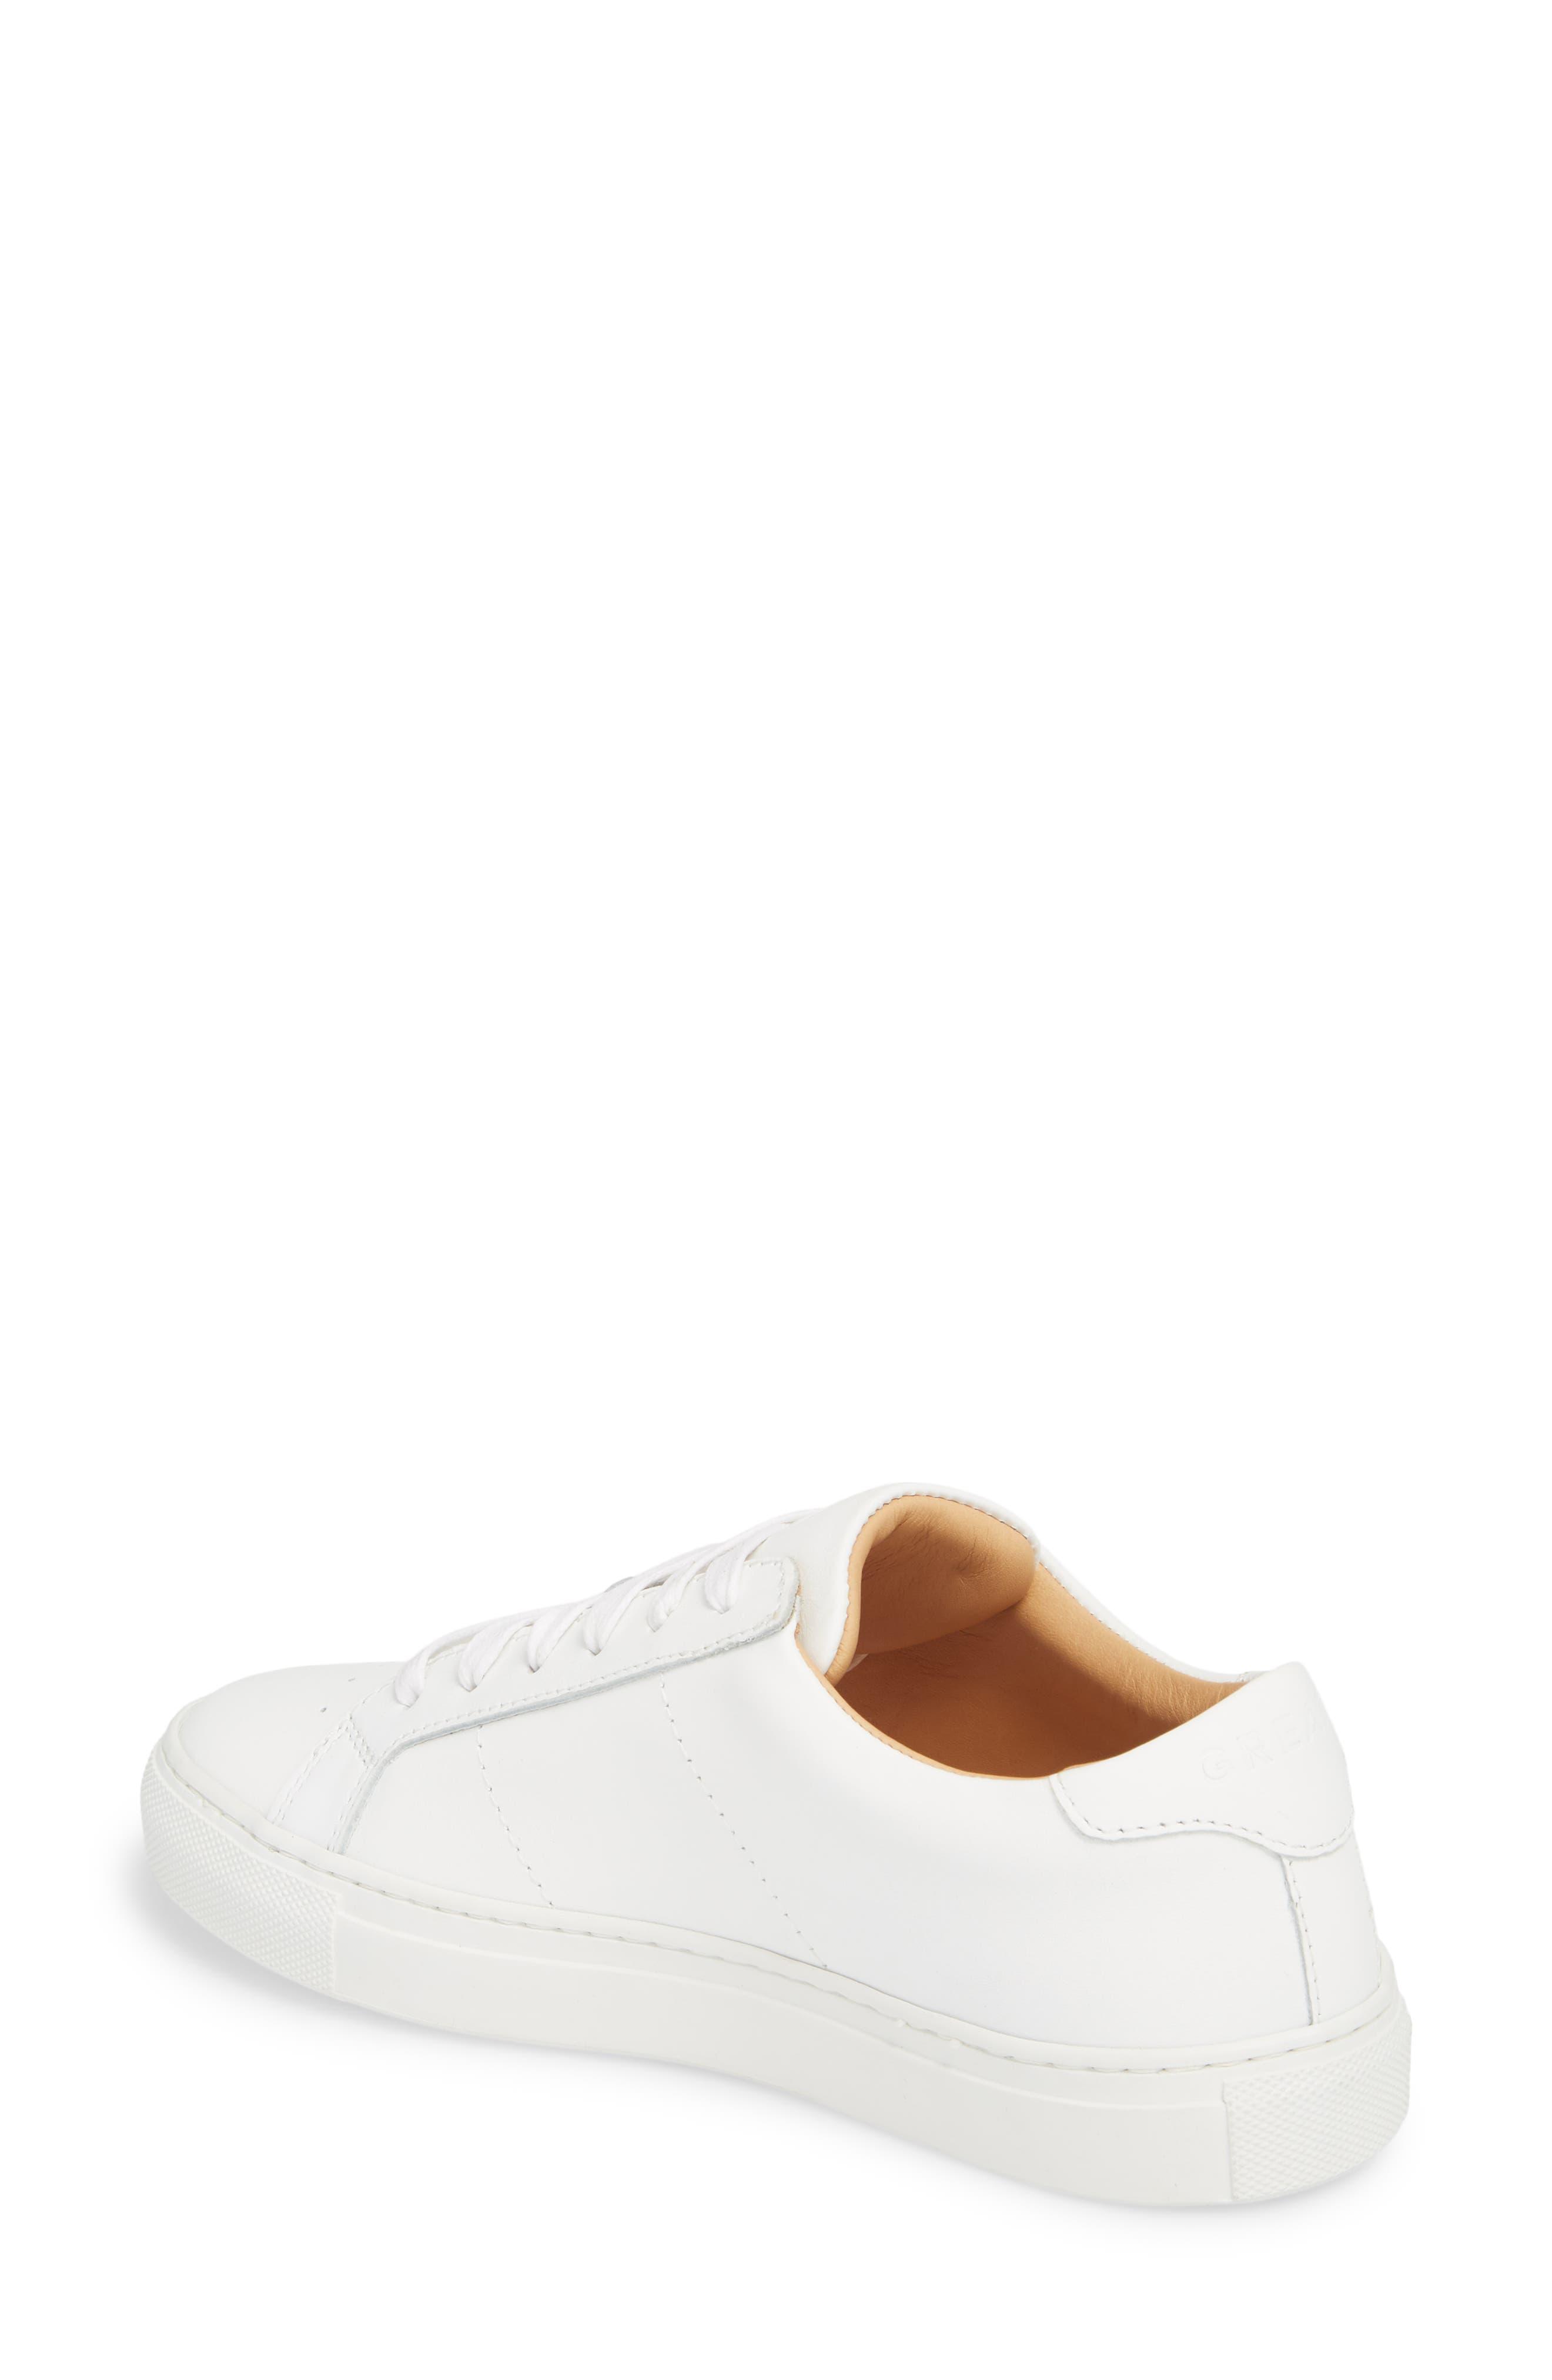 Royale Sneaker,                             Alternate thumbnail 2, color,                             White Flat Leather